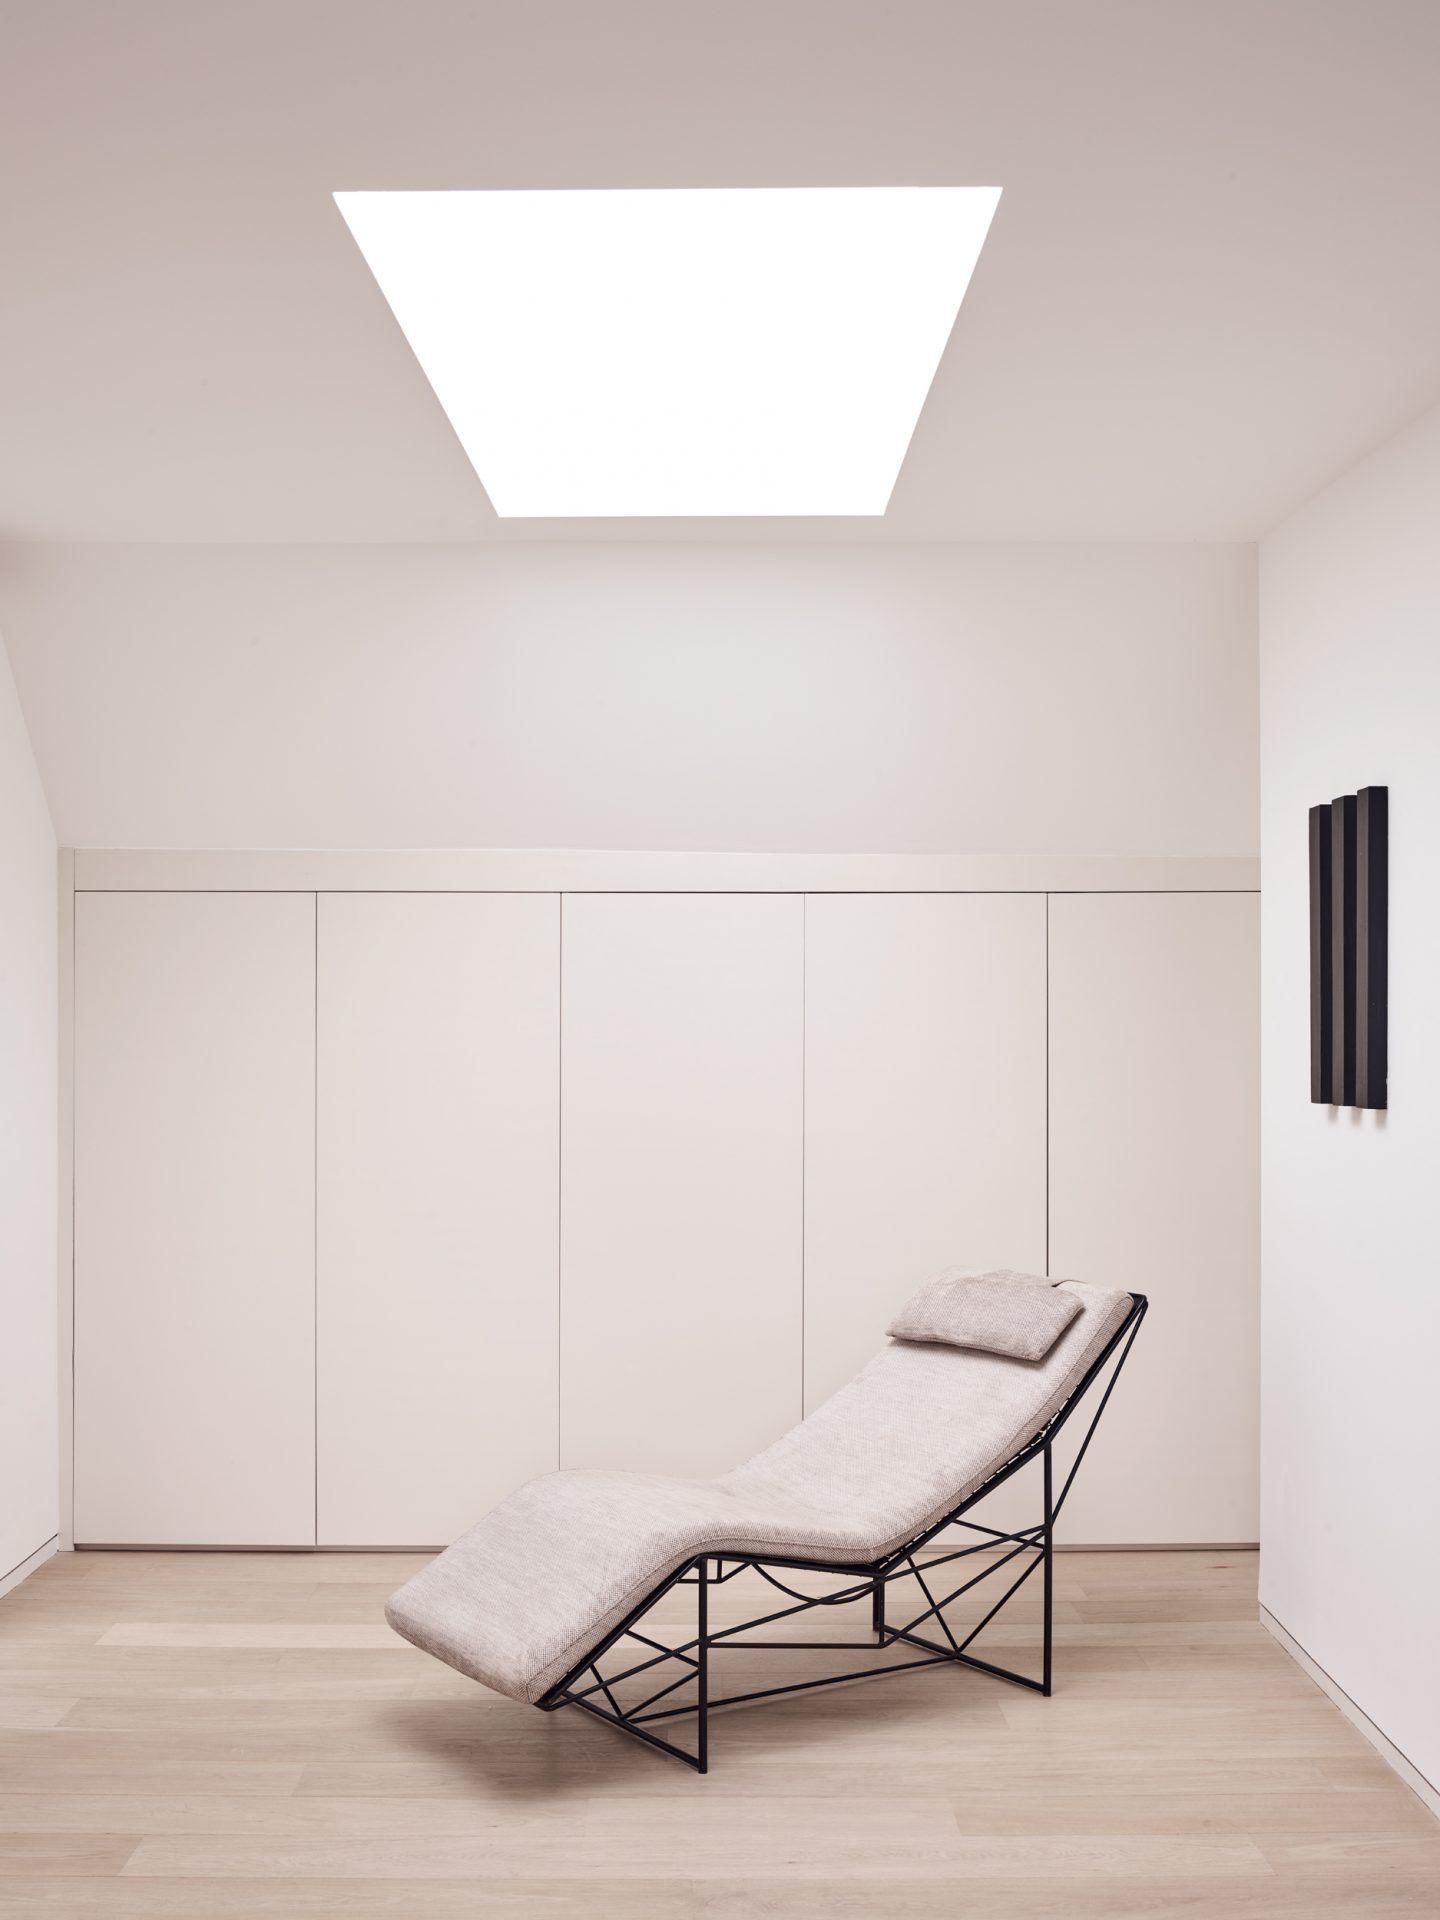 IGNANT-Design-DayTripStudio-PowerscroftRoad-26